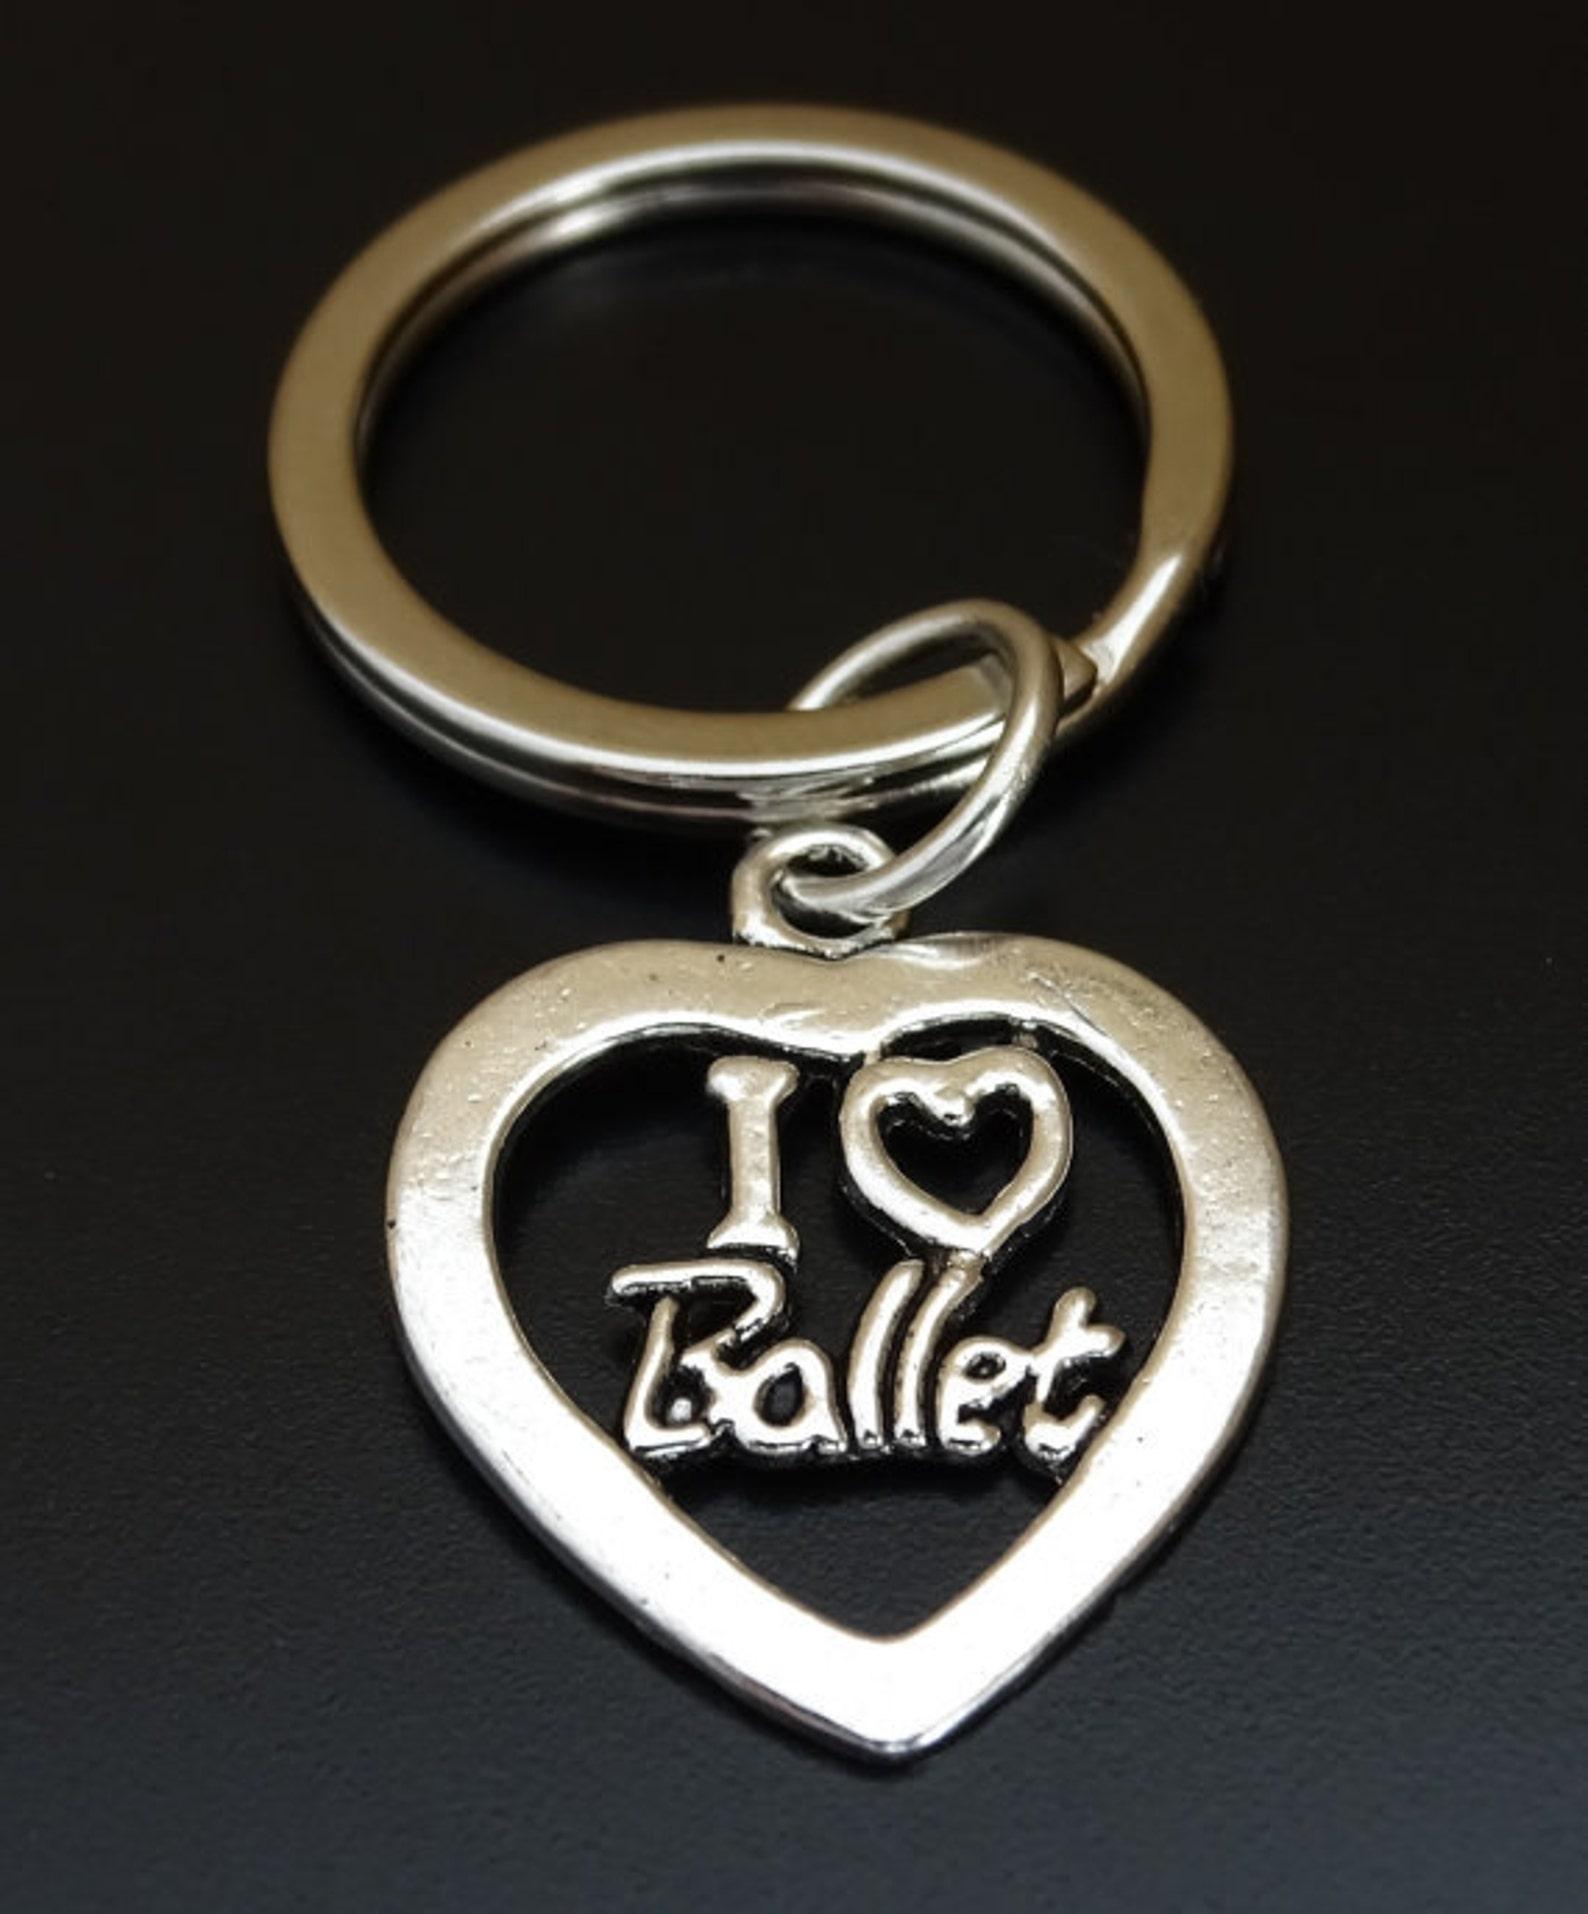 ballerina keychain, custom keychain, custom key ring, tutu keychain, ballerina charm, ballerina jewelry, tutu charms, ballet sho